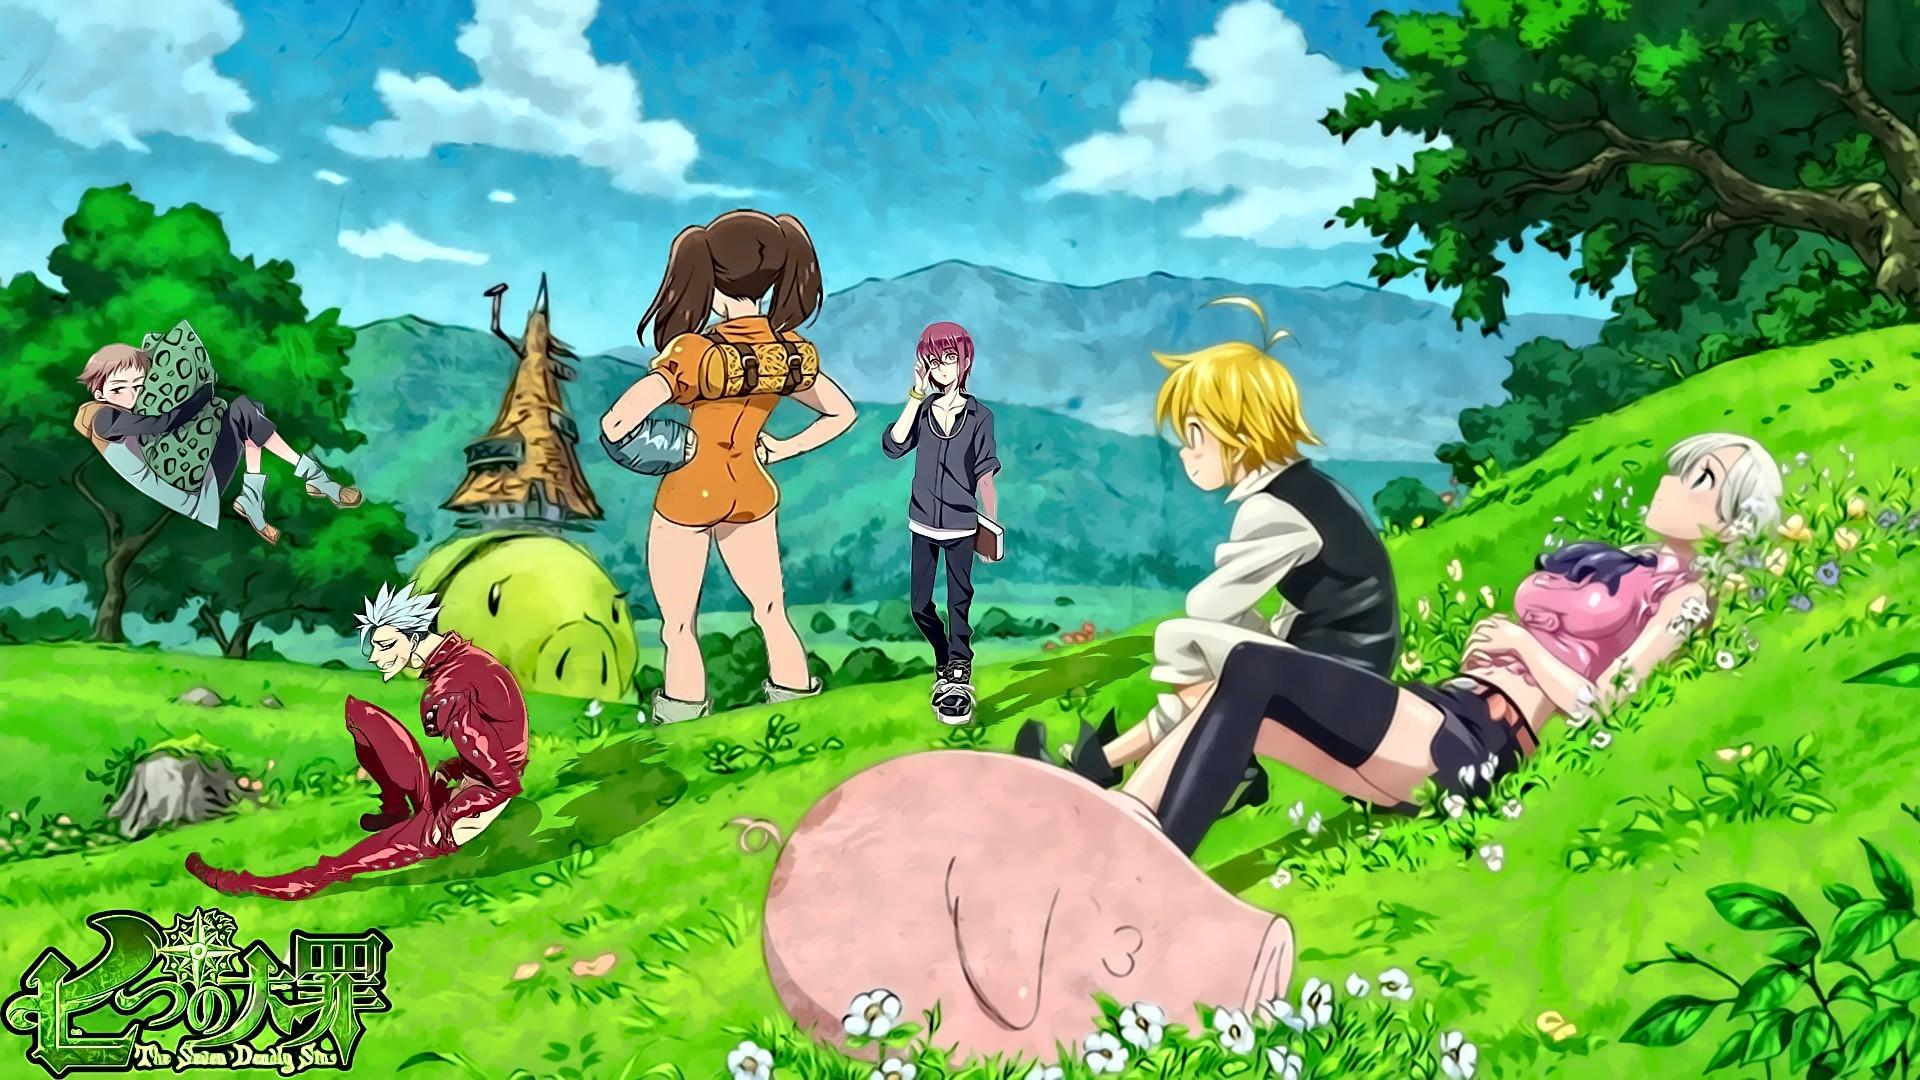 Anime Nanatsu no Taizai meliodas Ban Elizabeth Liones Diane (Sin  of Envy) Fairy